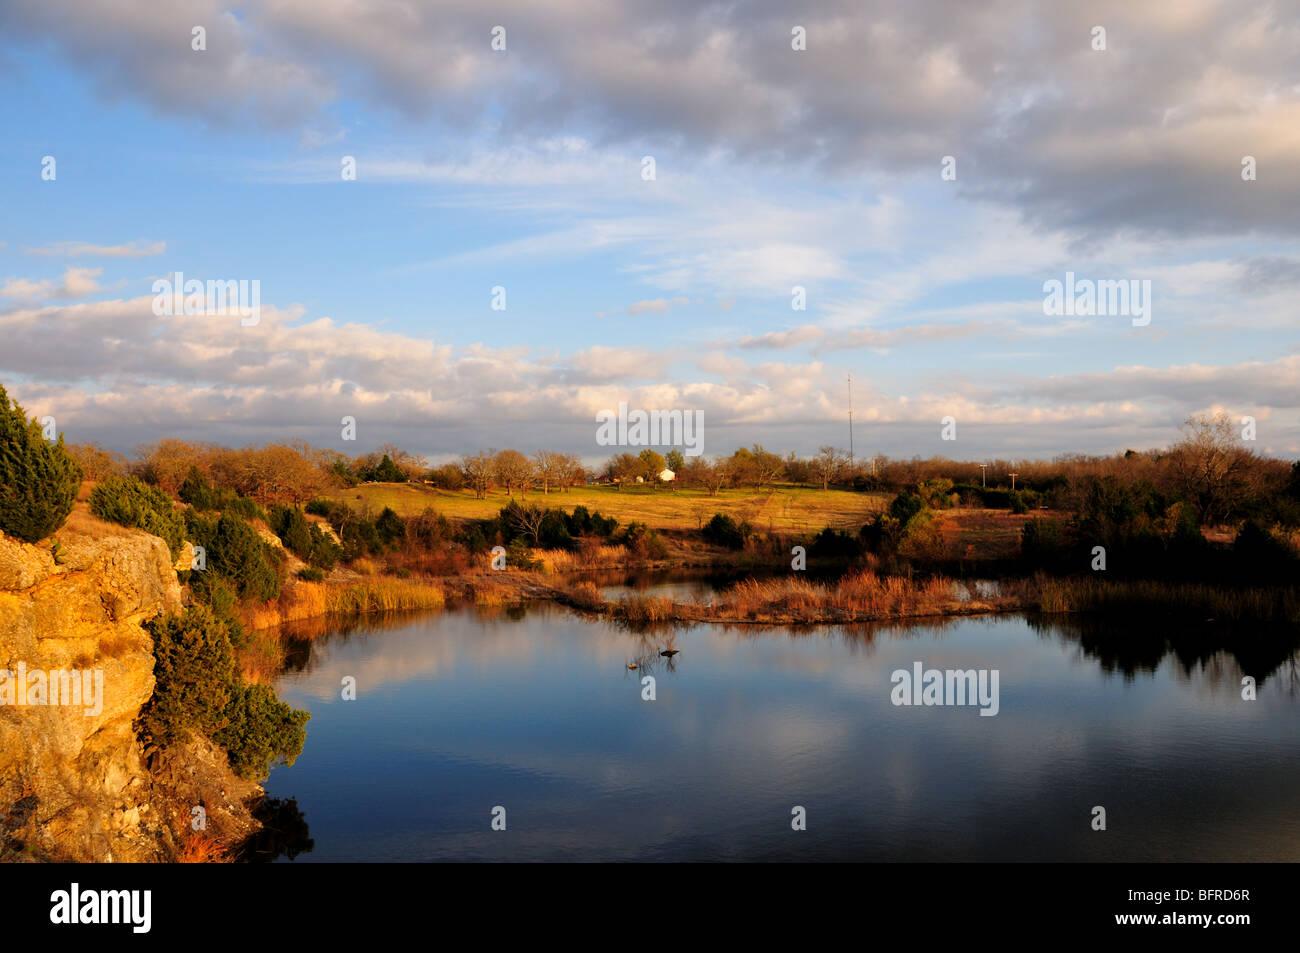 Scenic landscape. Oklahoma, USA. Stock Photo